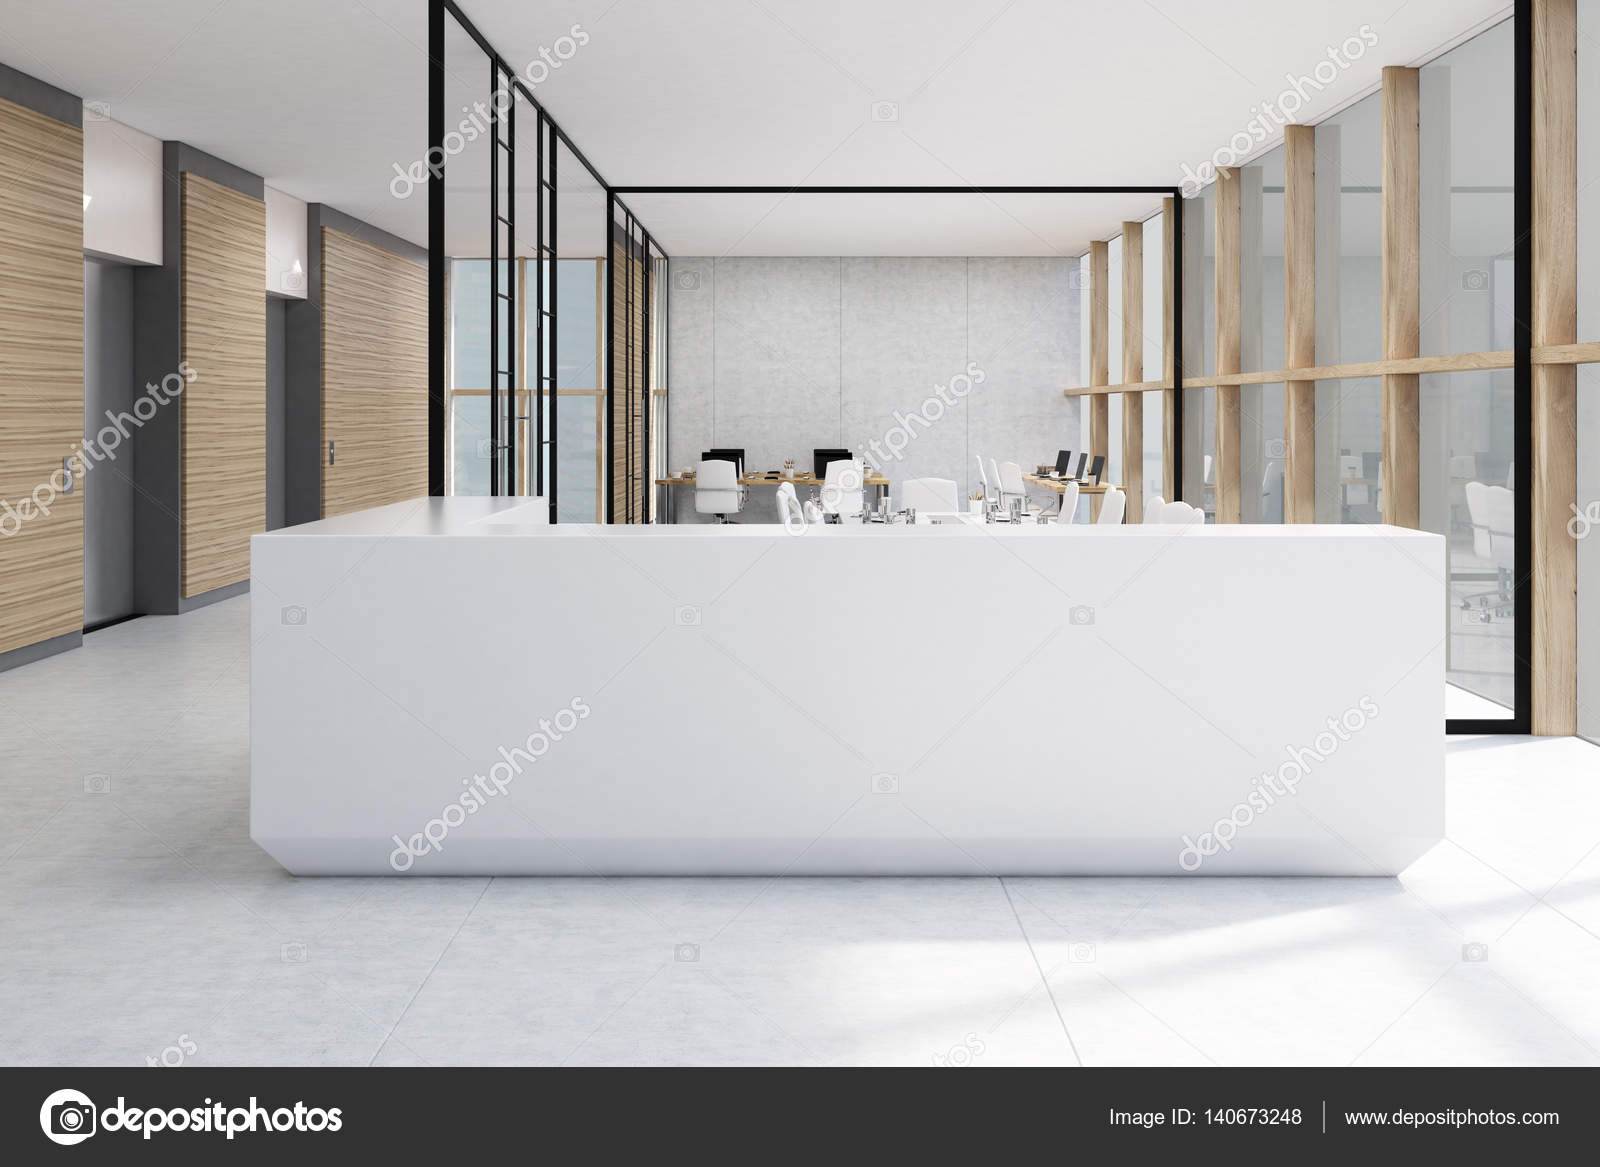 Weiße Rezeption und Glas-Büro — Stockfoto © denisismagilov #140673248